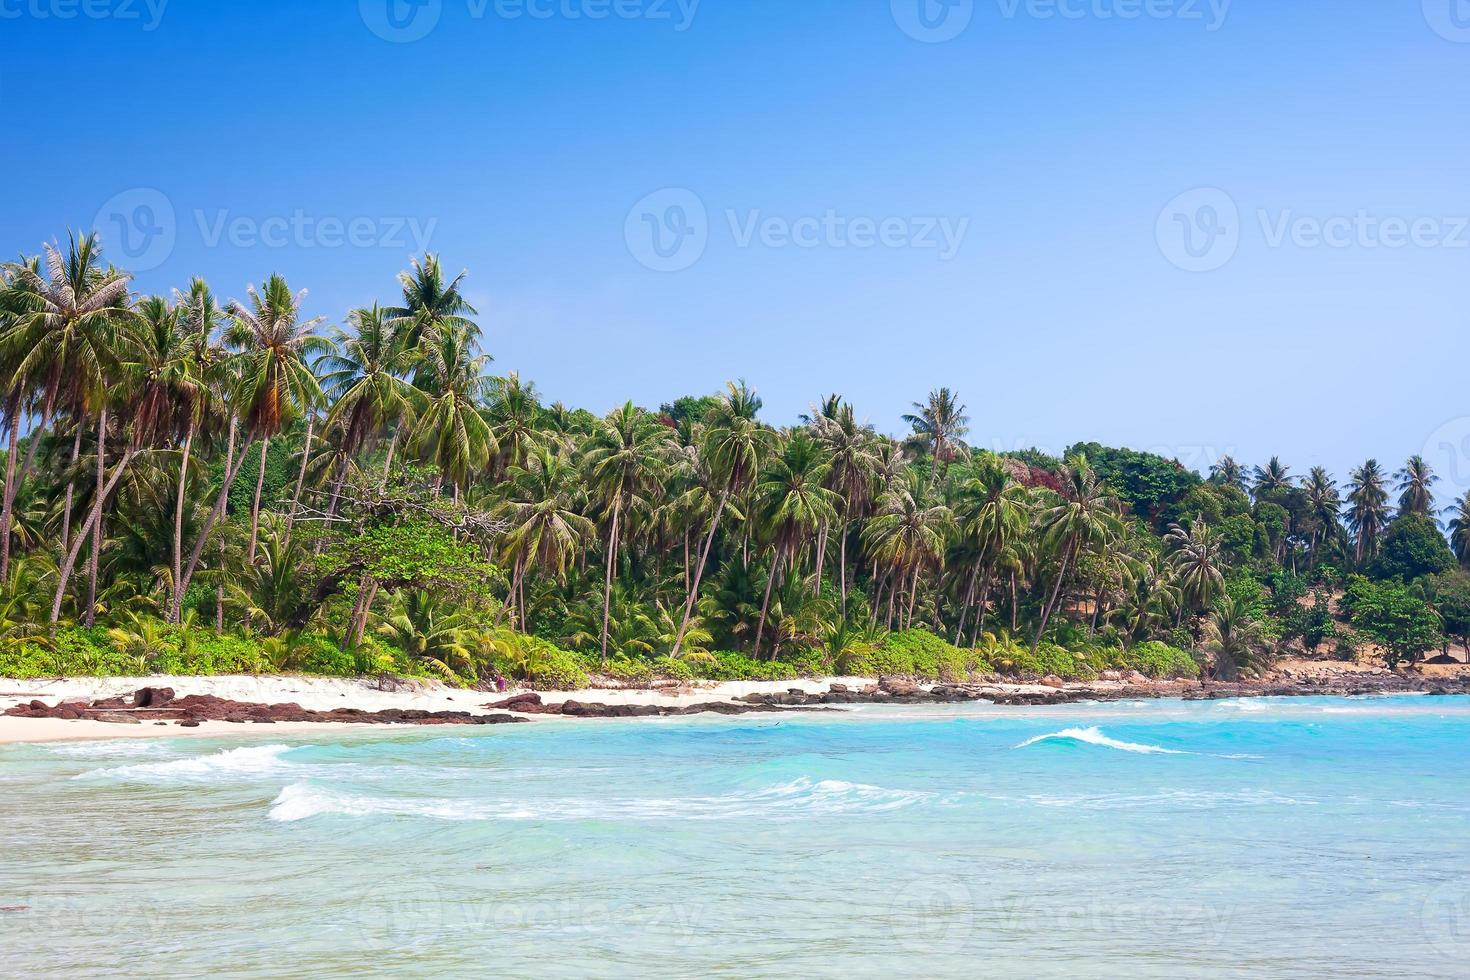 Tropical white sand beach with palm trees. Koh Kood, Thailand photo